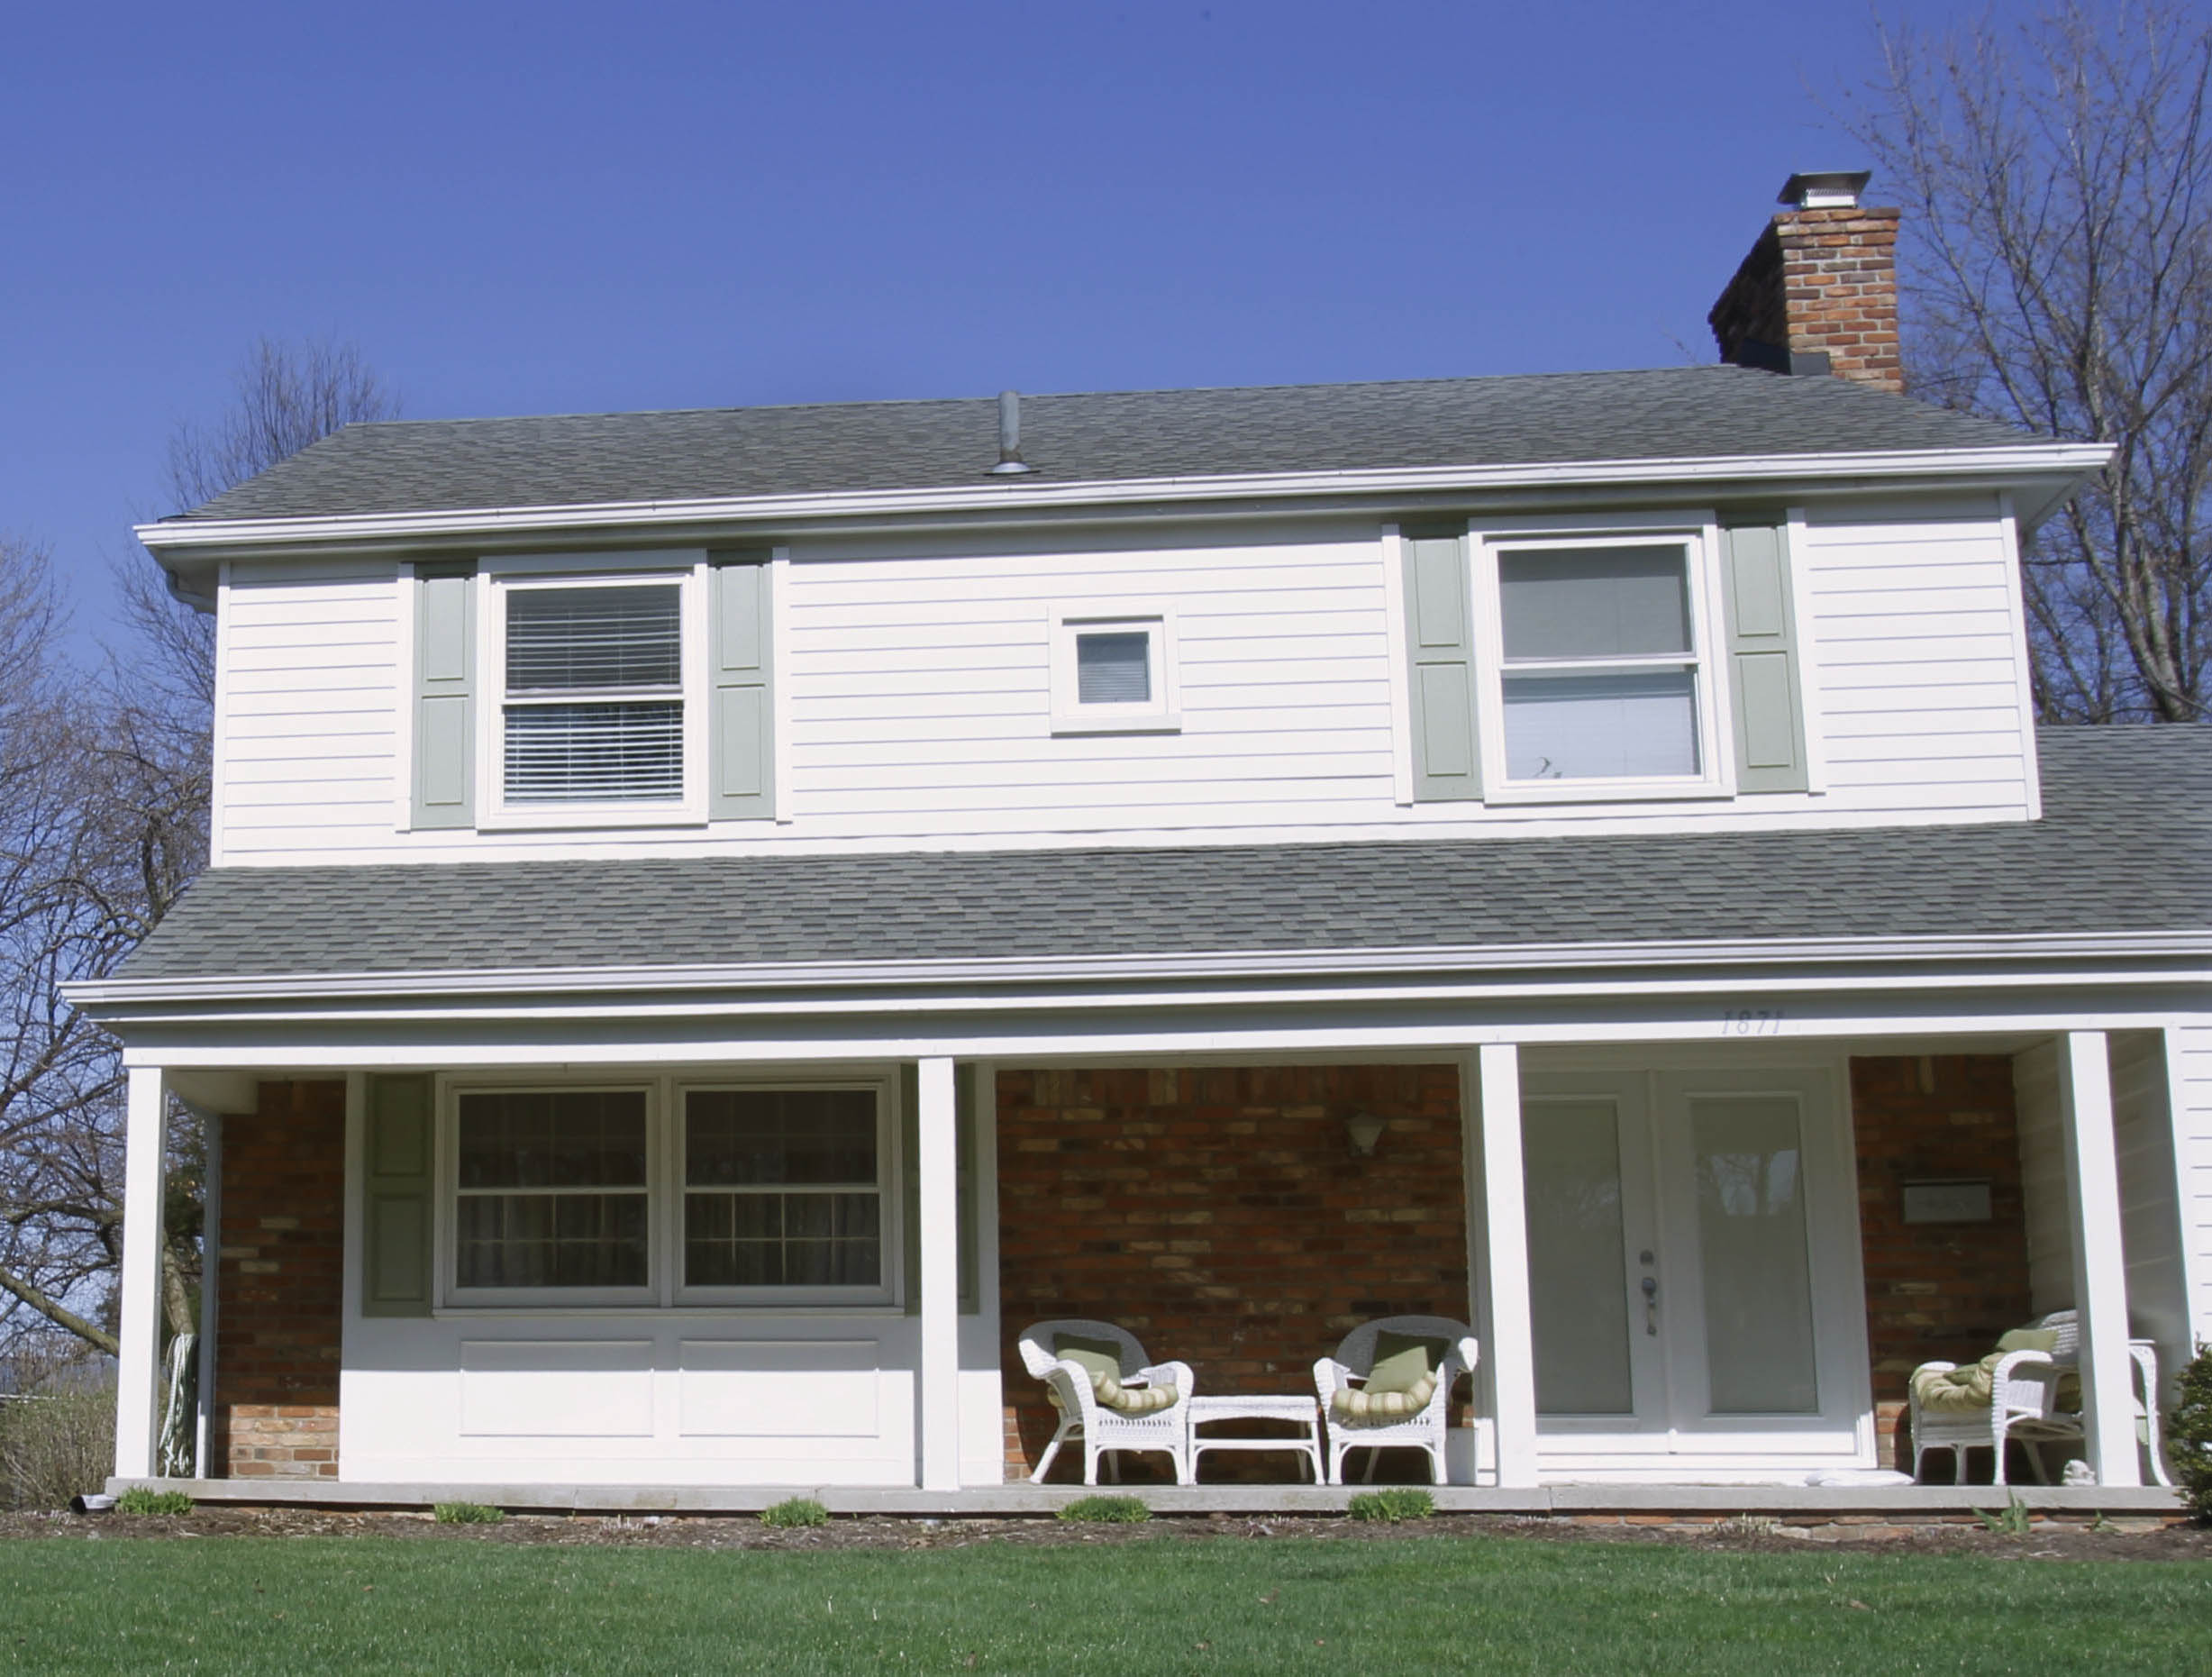 King County Washington Property Tax Bill